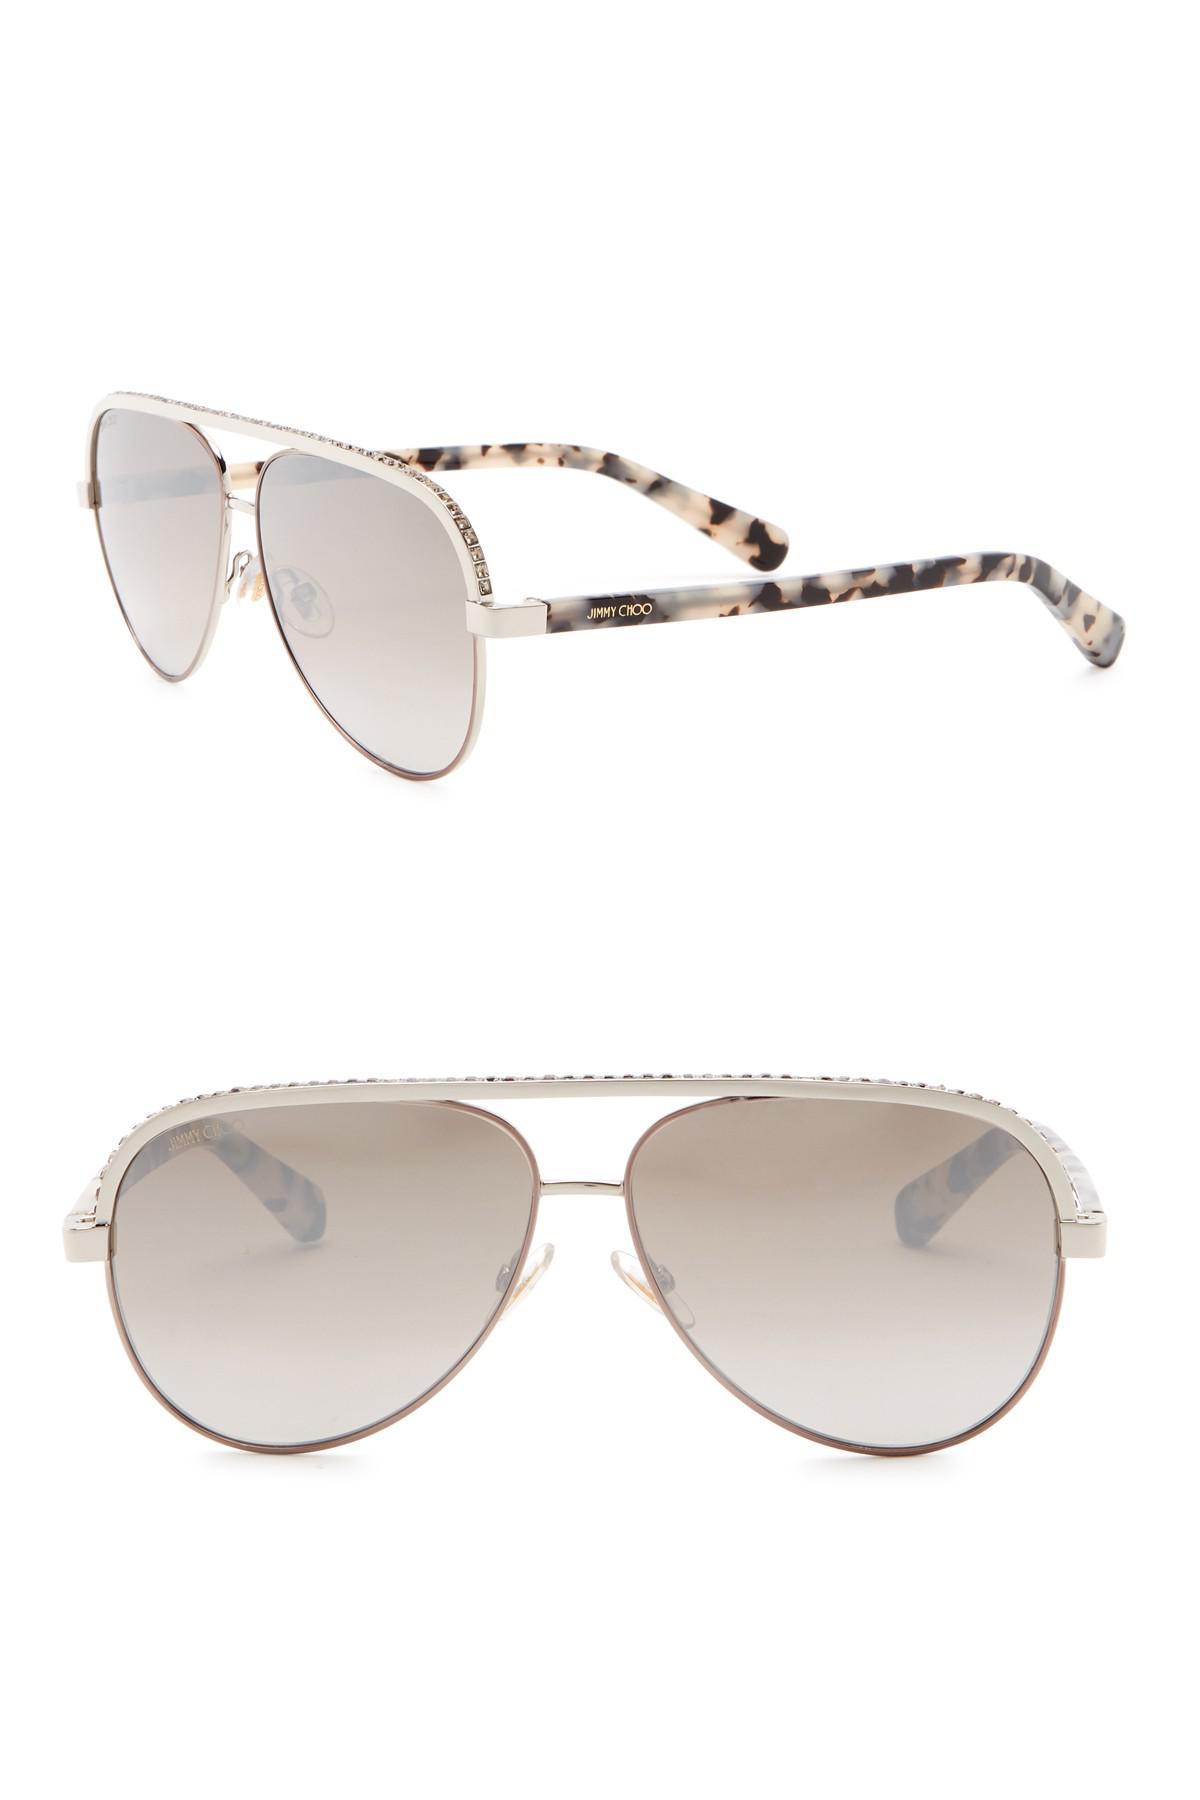 c73e6d22543c3 Lyst - Jimmy Choo Linas 59mm Aviator Sunglasses